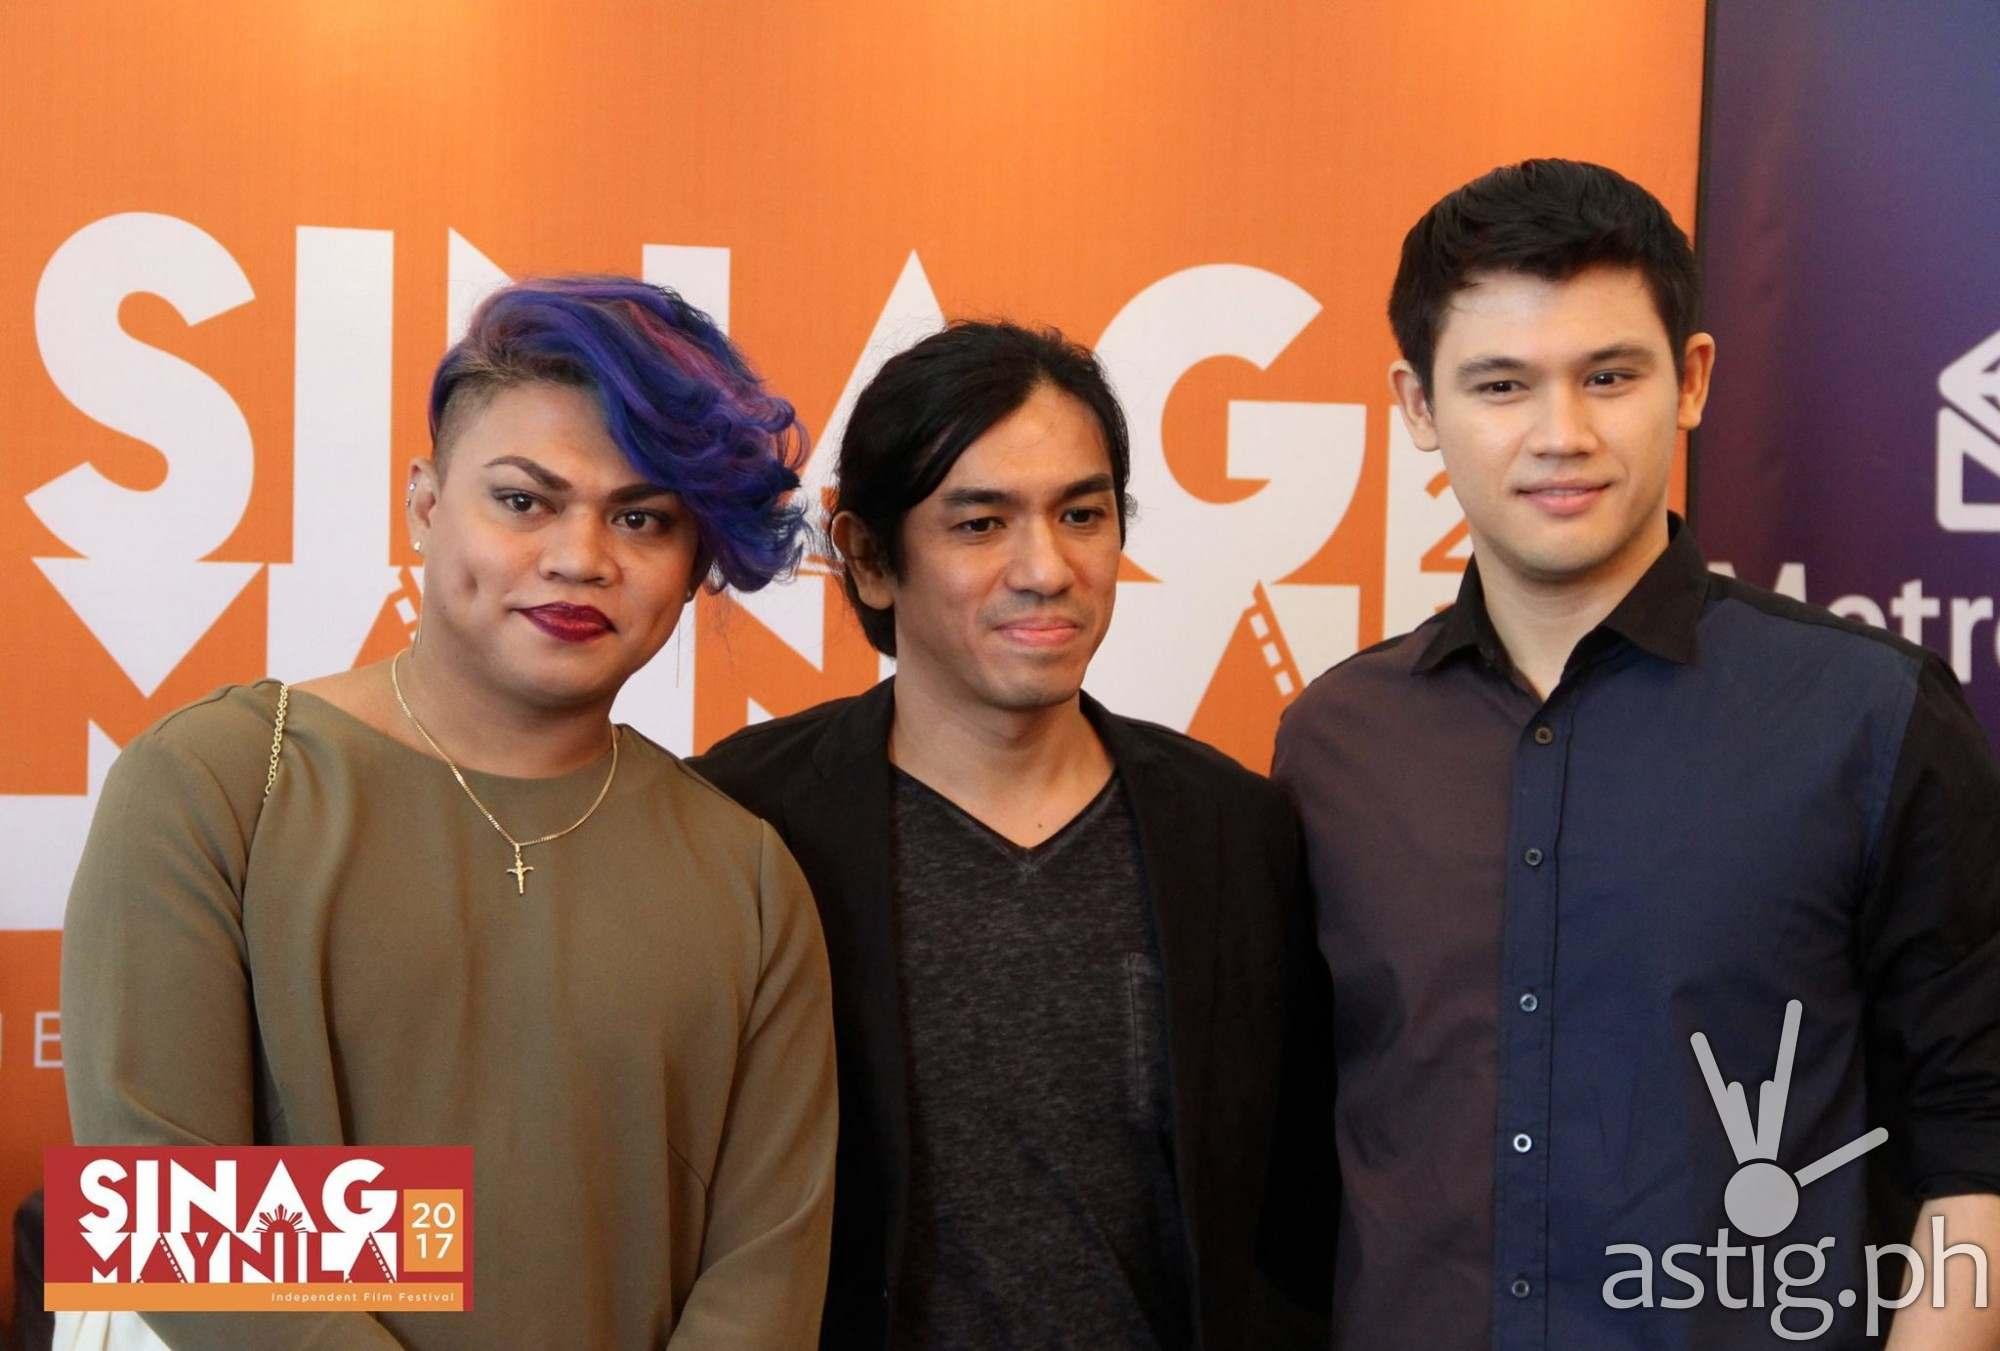 Sine lokal pang internasyonal sinag maynila 2017 indie film fest astig ph - Gloriette fer smeden ...